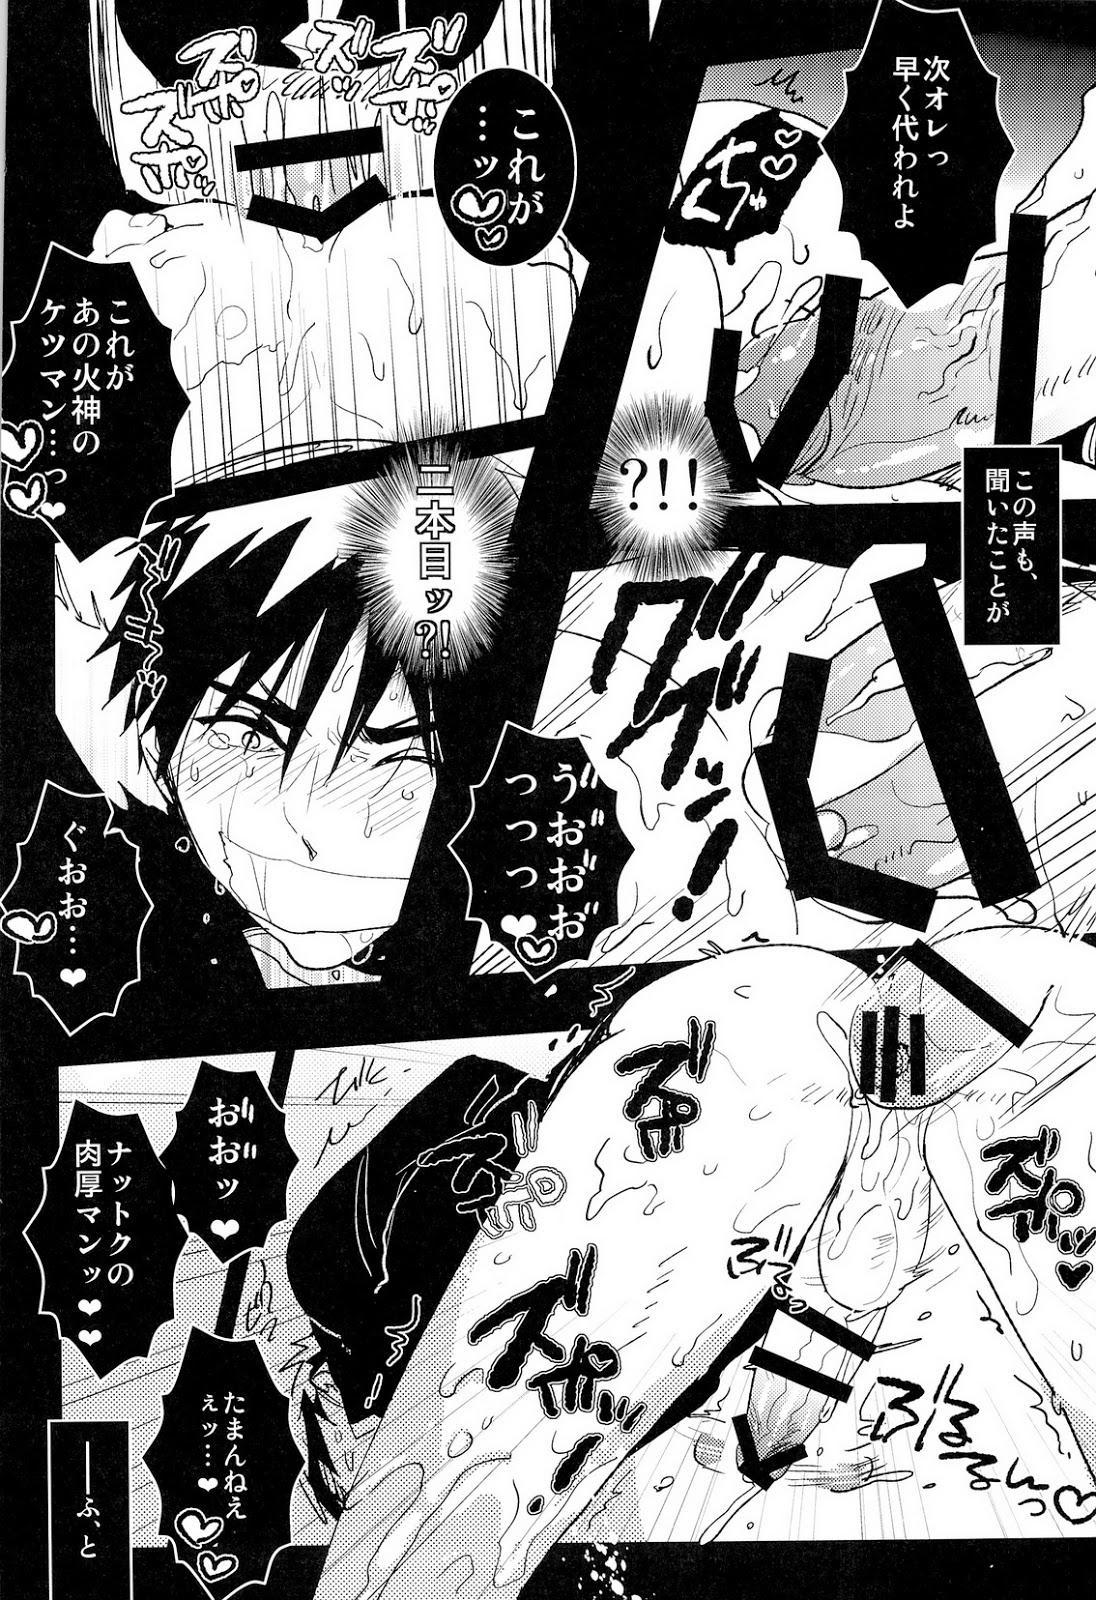 Kabejiri Hon - DK Fuck 15